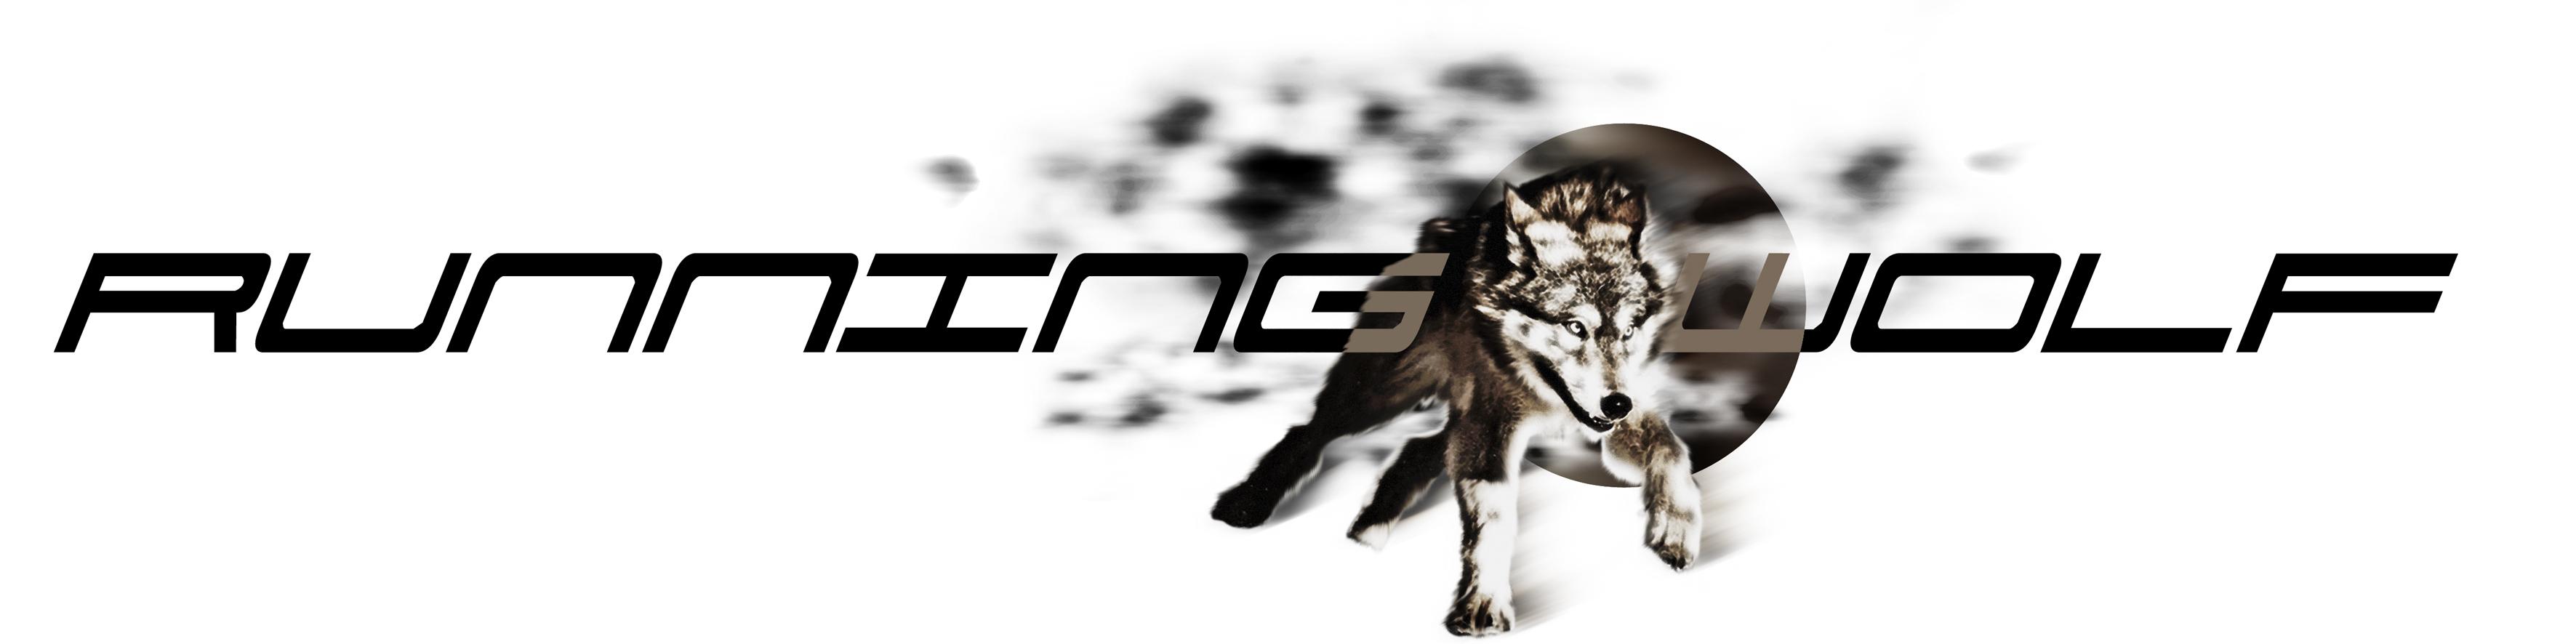 runningwolf-logo-01